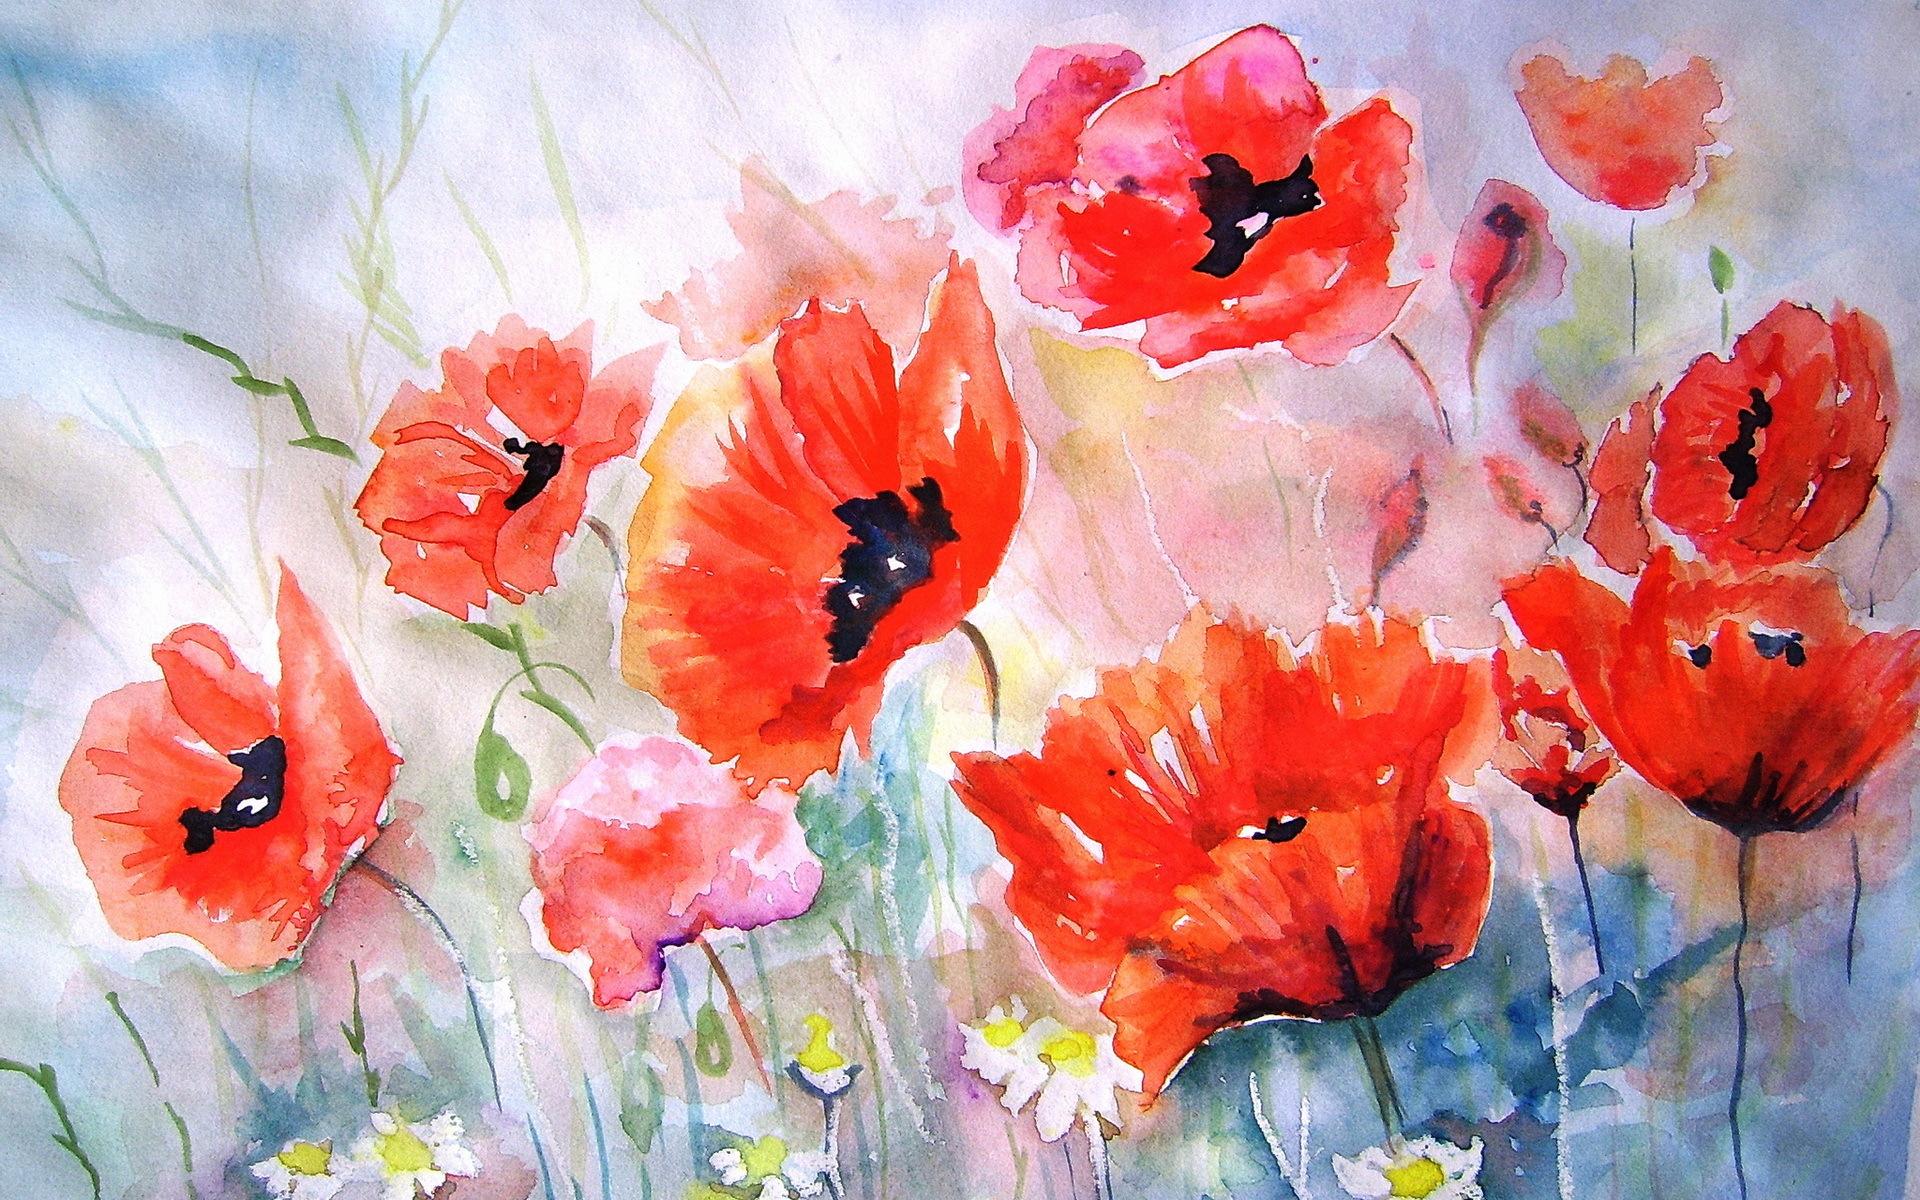 poppies flower art painting bokeh wallpaper backgroundPoppies Watercolor Painting